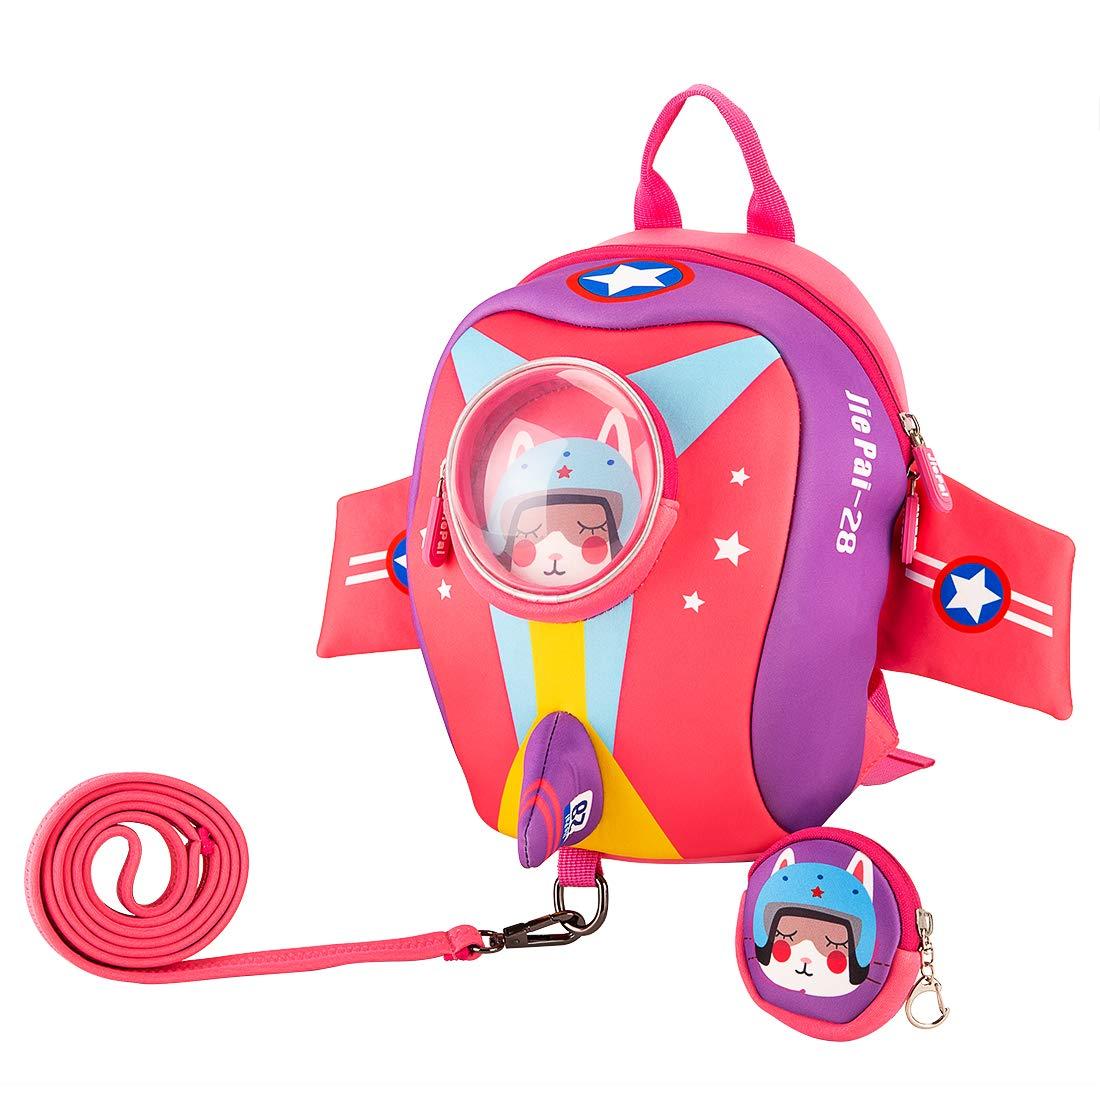 JiePai Toddler Kids Backpack with Safety Harness Leash, Waterproof 3D Cartoon Boys/Girls Backpack Lightweight Cute Animal Backpack for Travel/Nursery/Kindergarten/Preschool, Age 1-3 Dinosaur Backpack